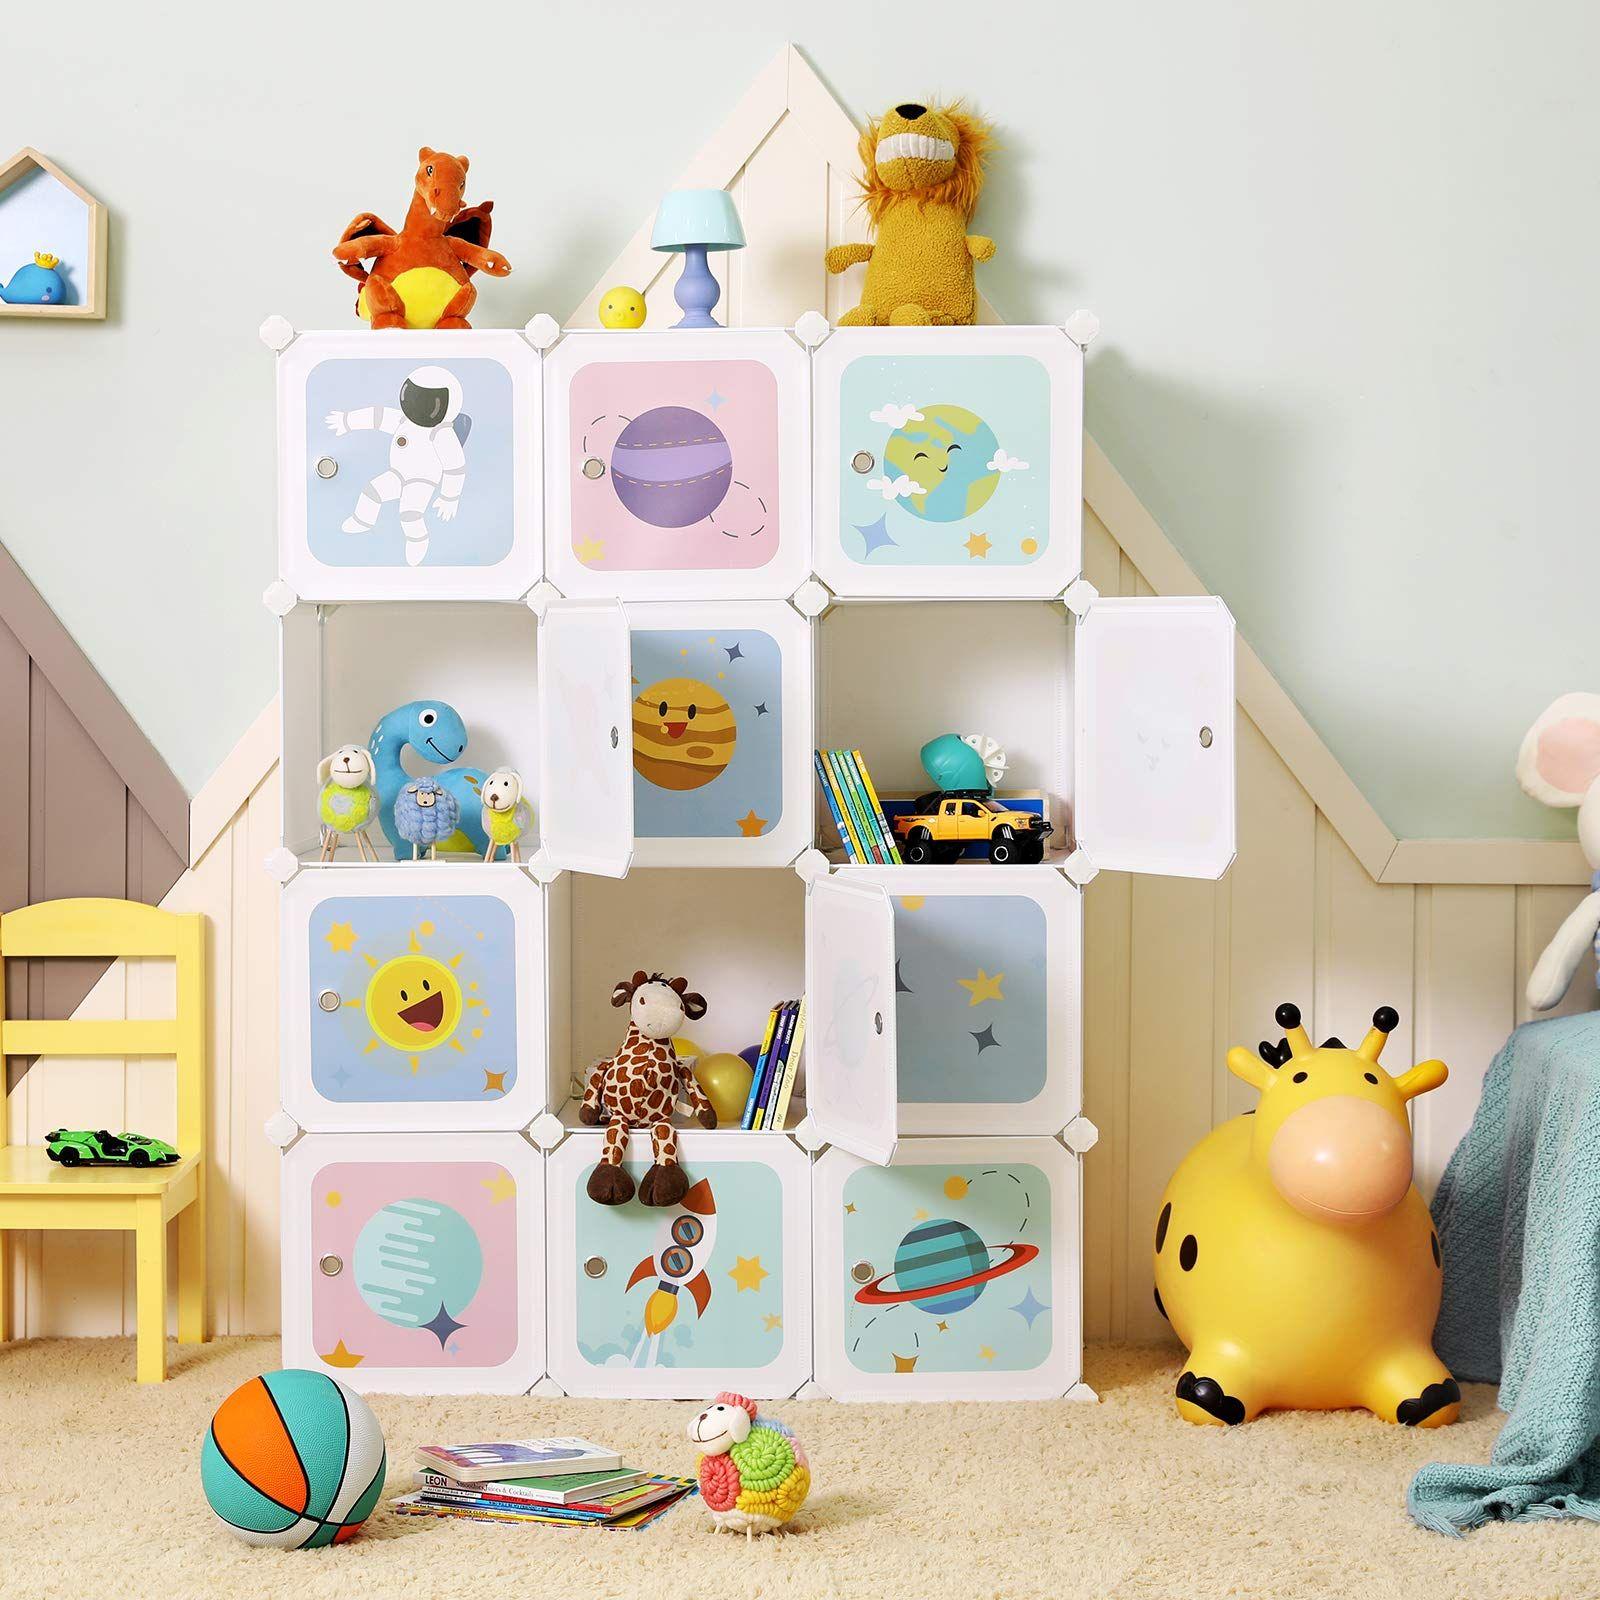 SONGMICS Toy Cube Storage Organizer …